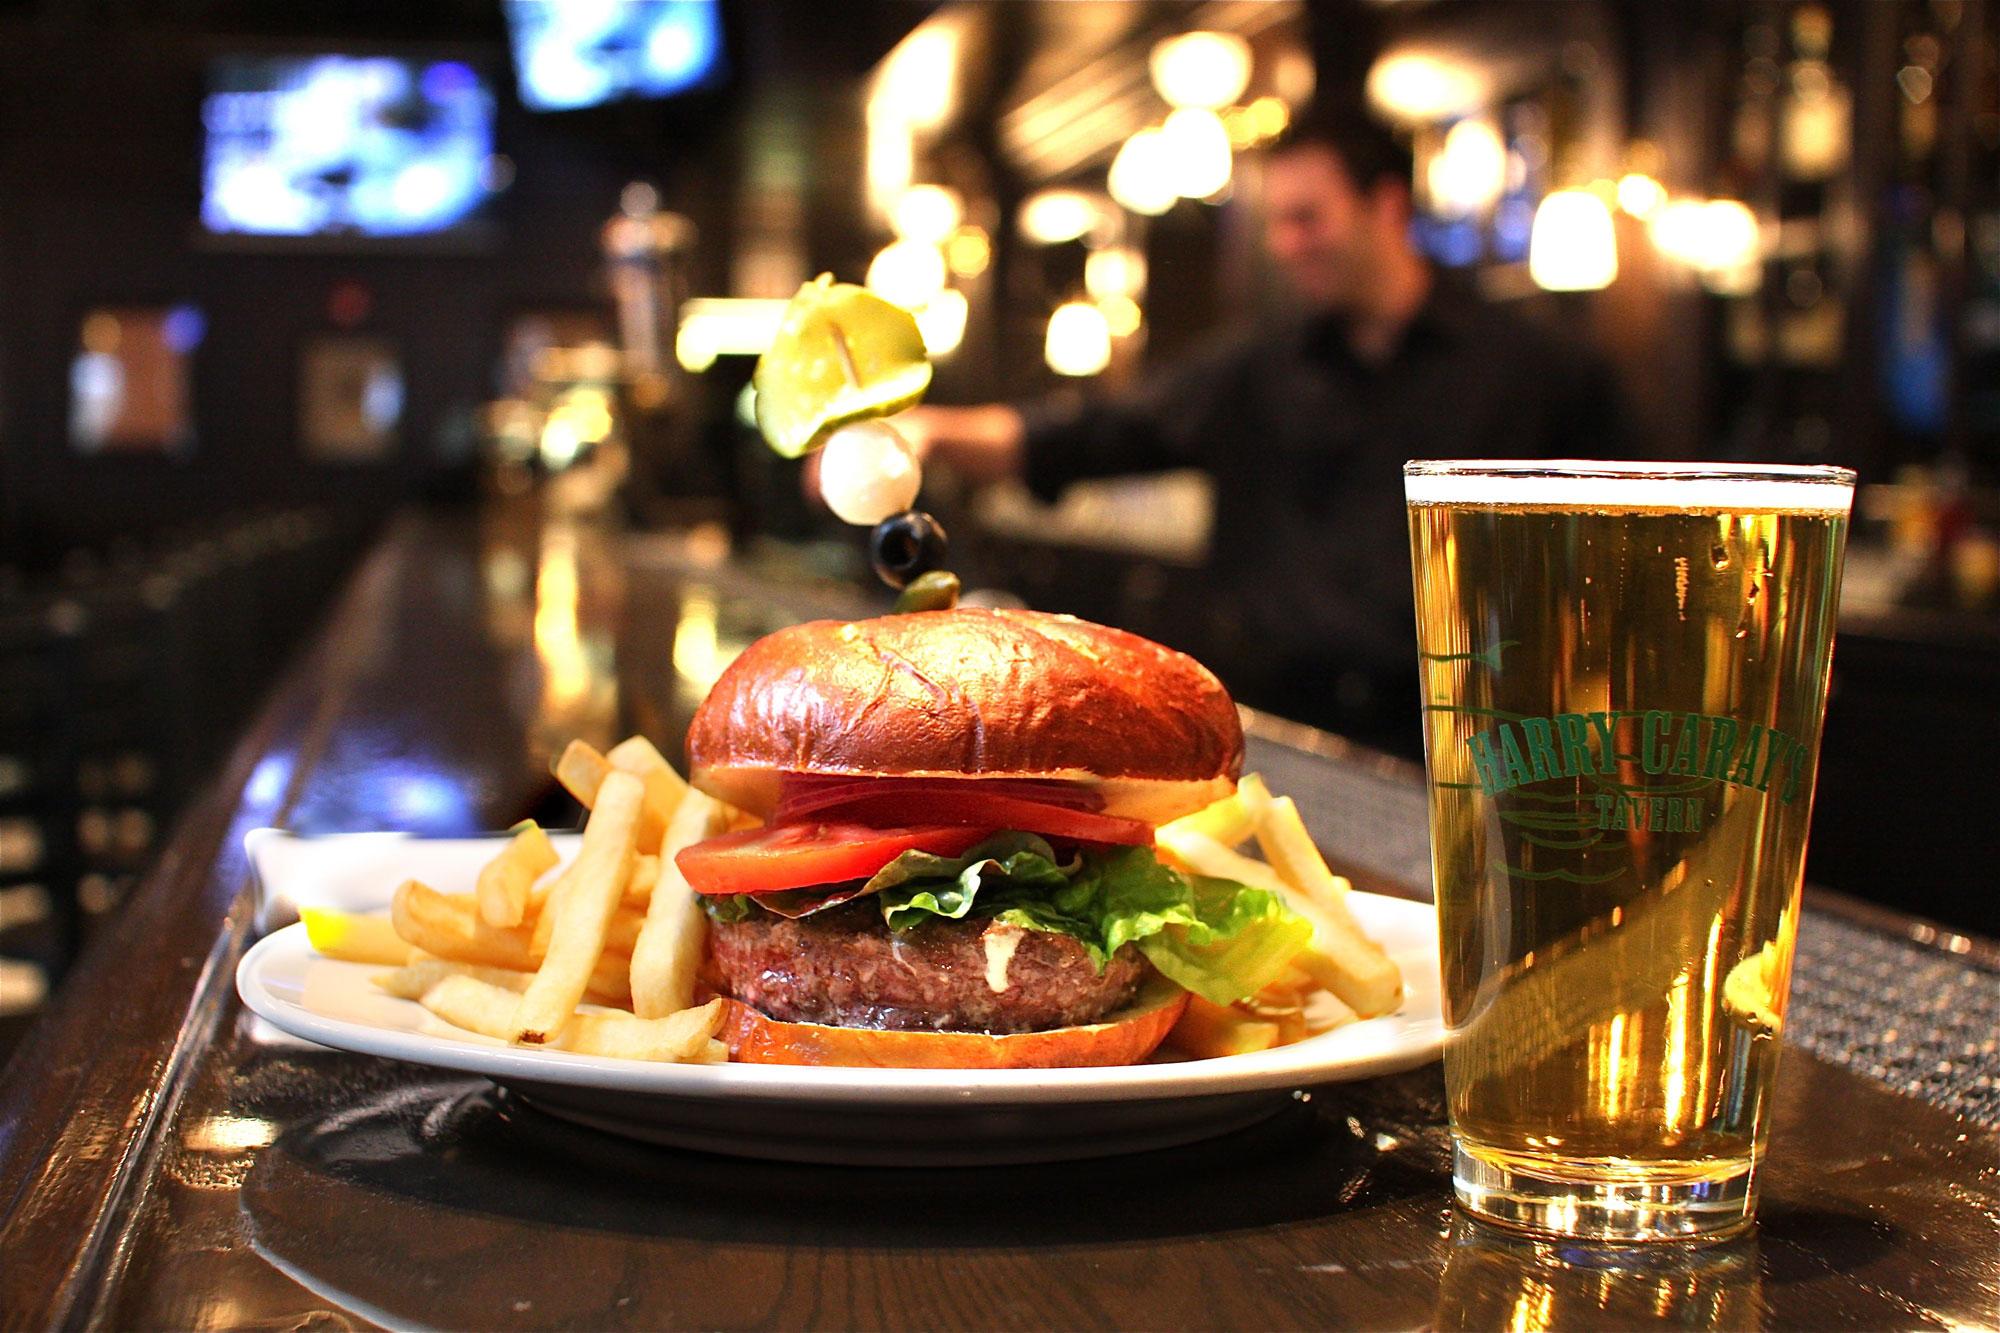 Celebrate National Cheeseburger Day at Navy Pier